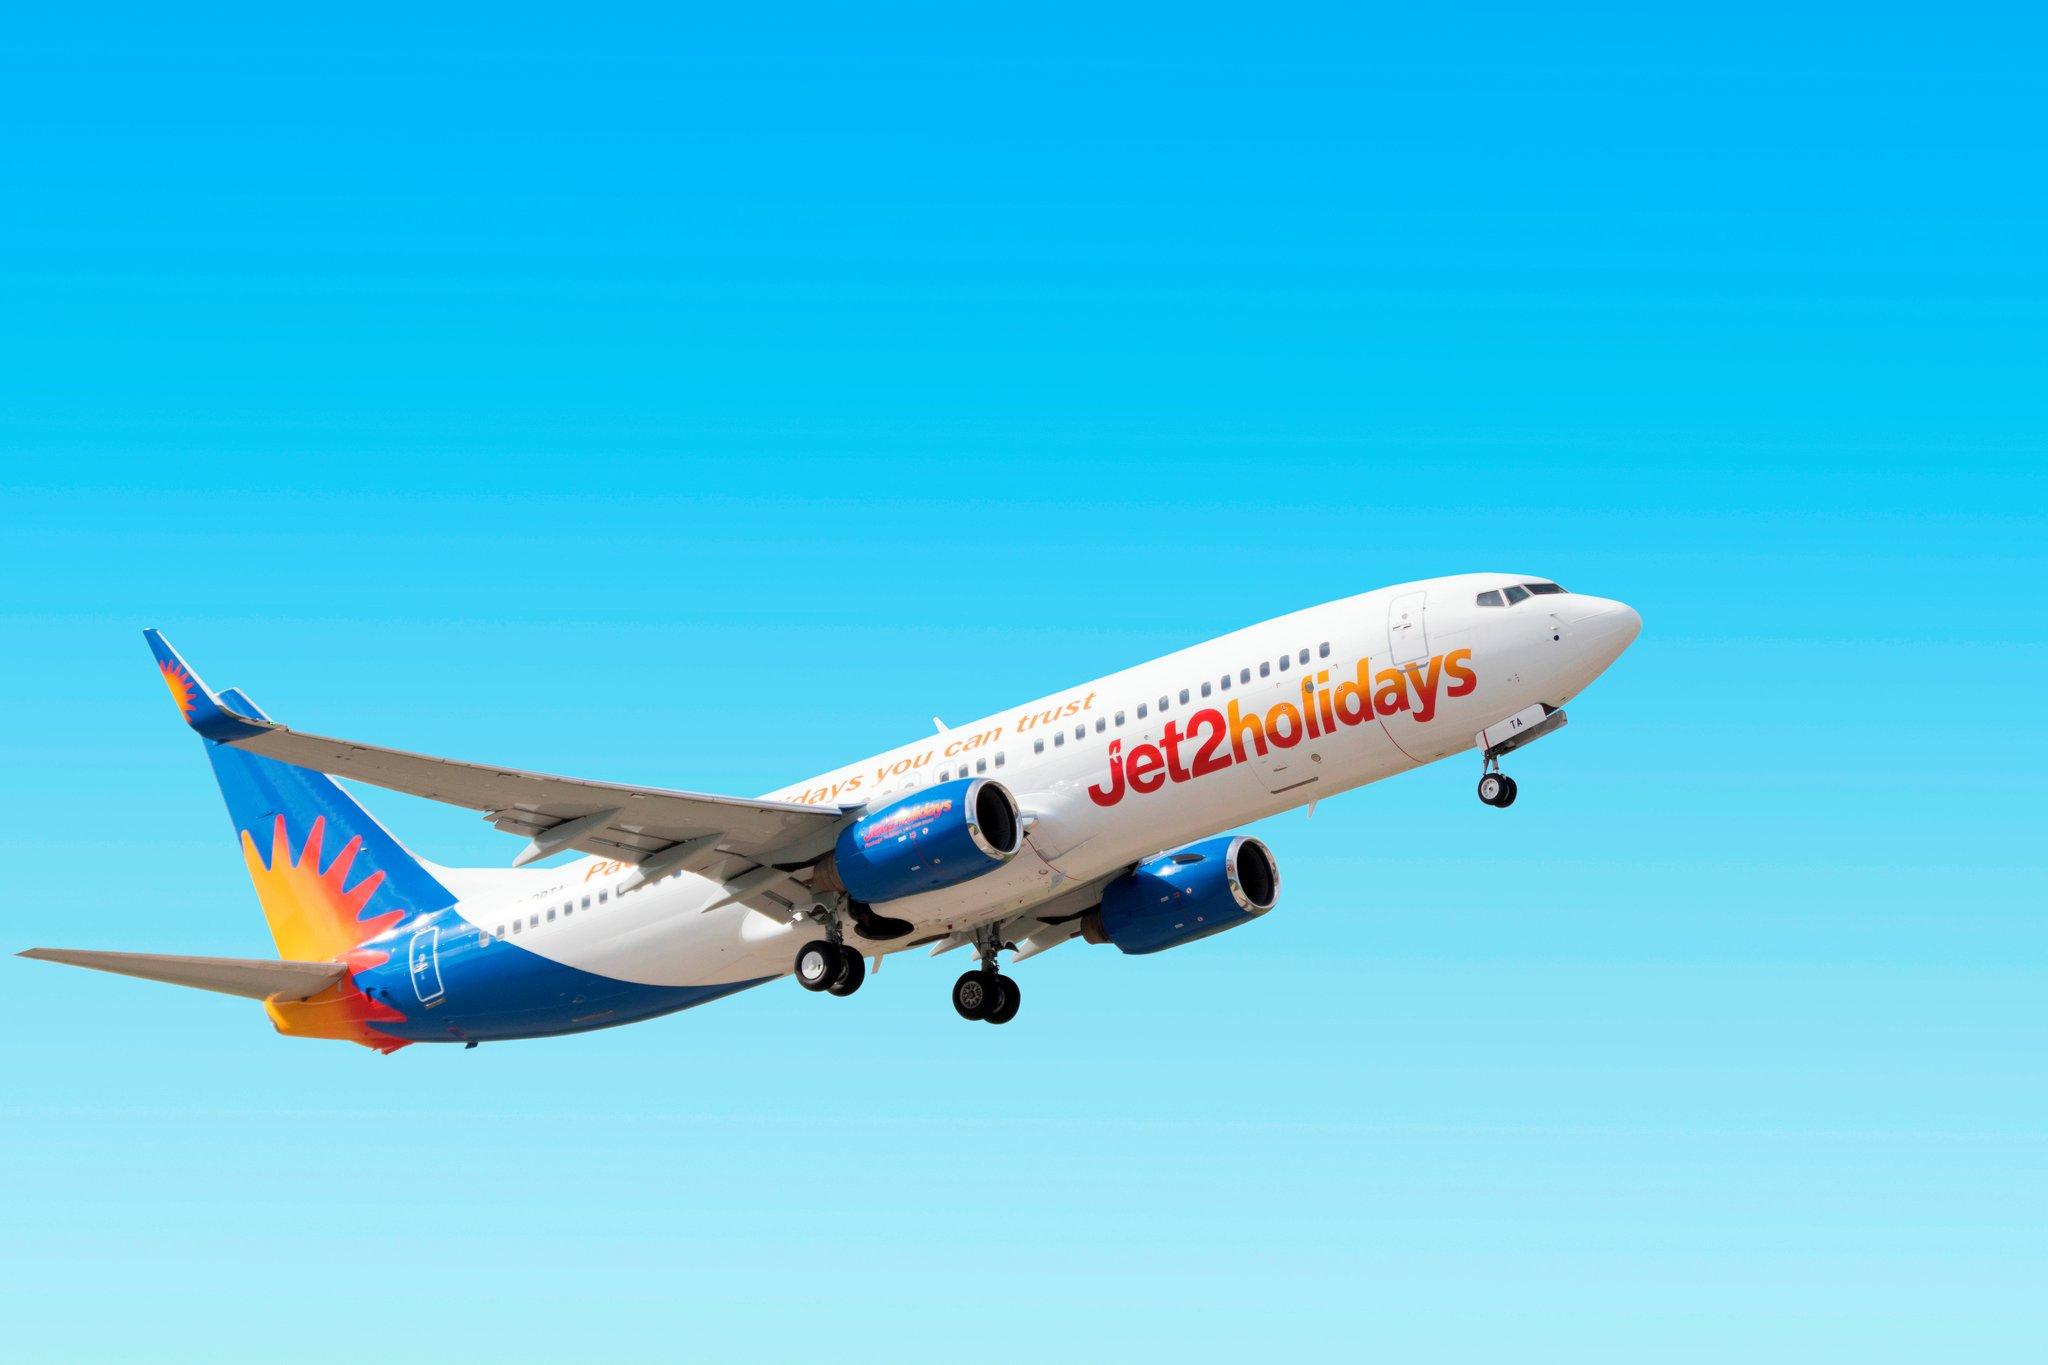 Jet2.com e Jet2holidays lanciano voli per l'estate 2022